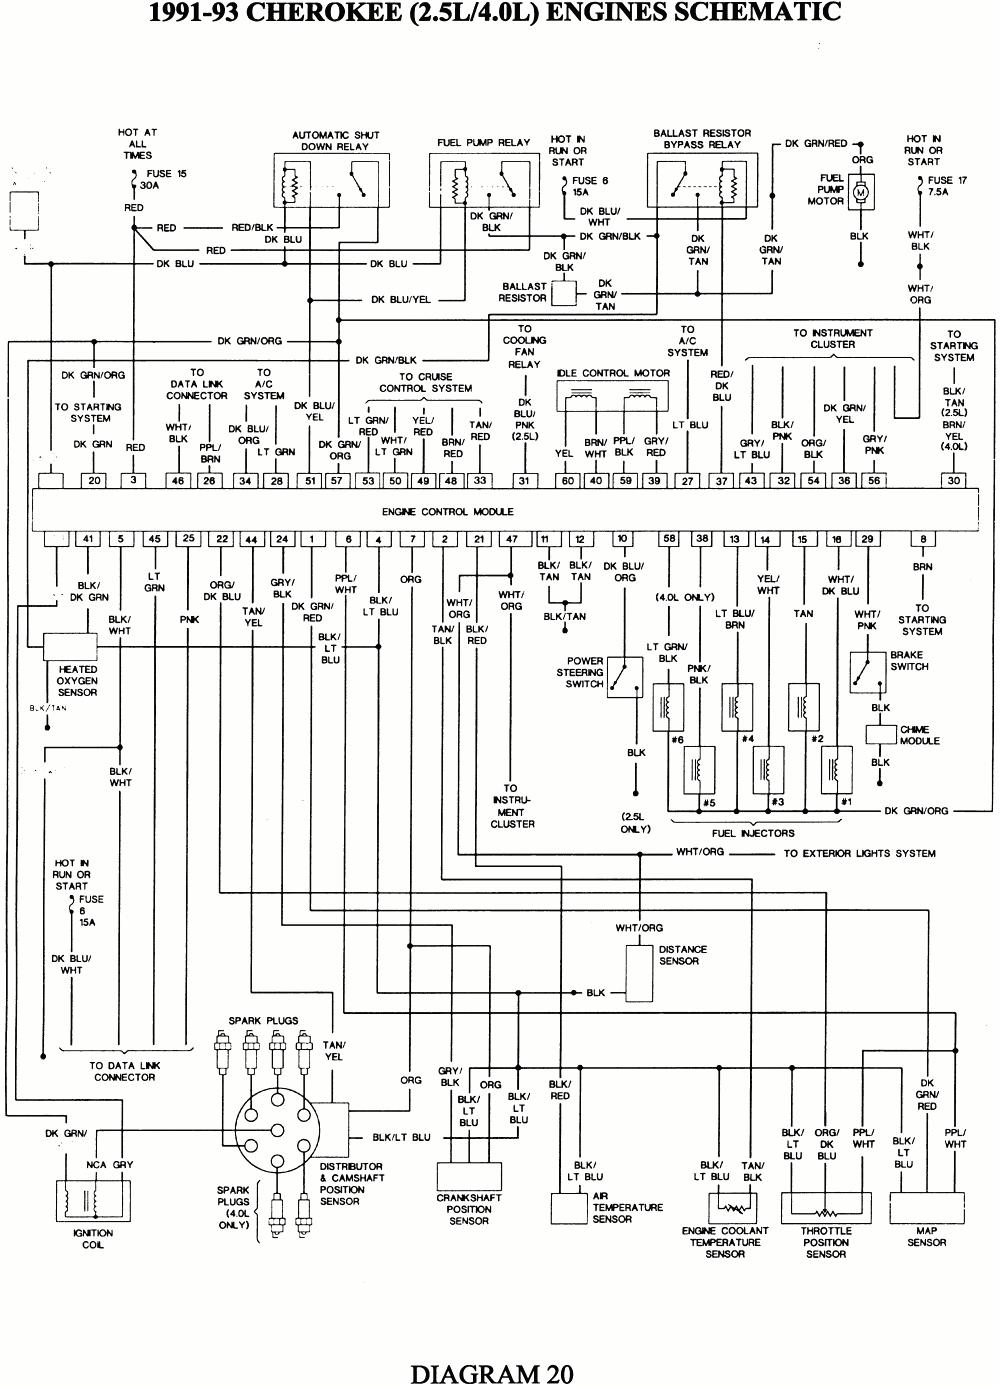 93 jeep grand cherokee wiring diagram wiring diagram dataradio wiring diagram for 93 jeep grand cherokee